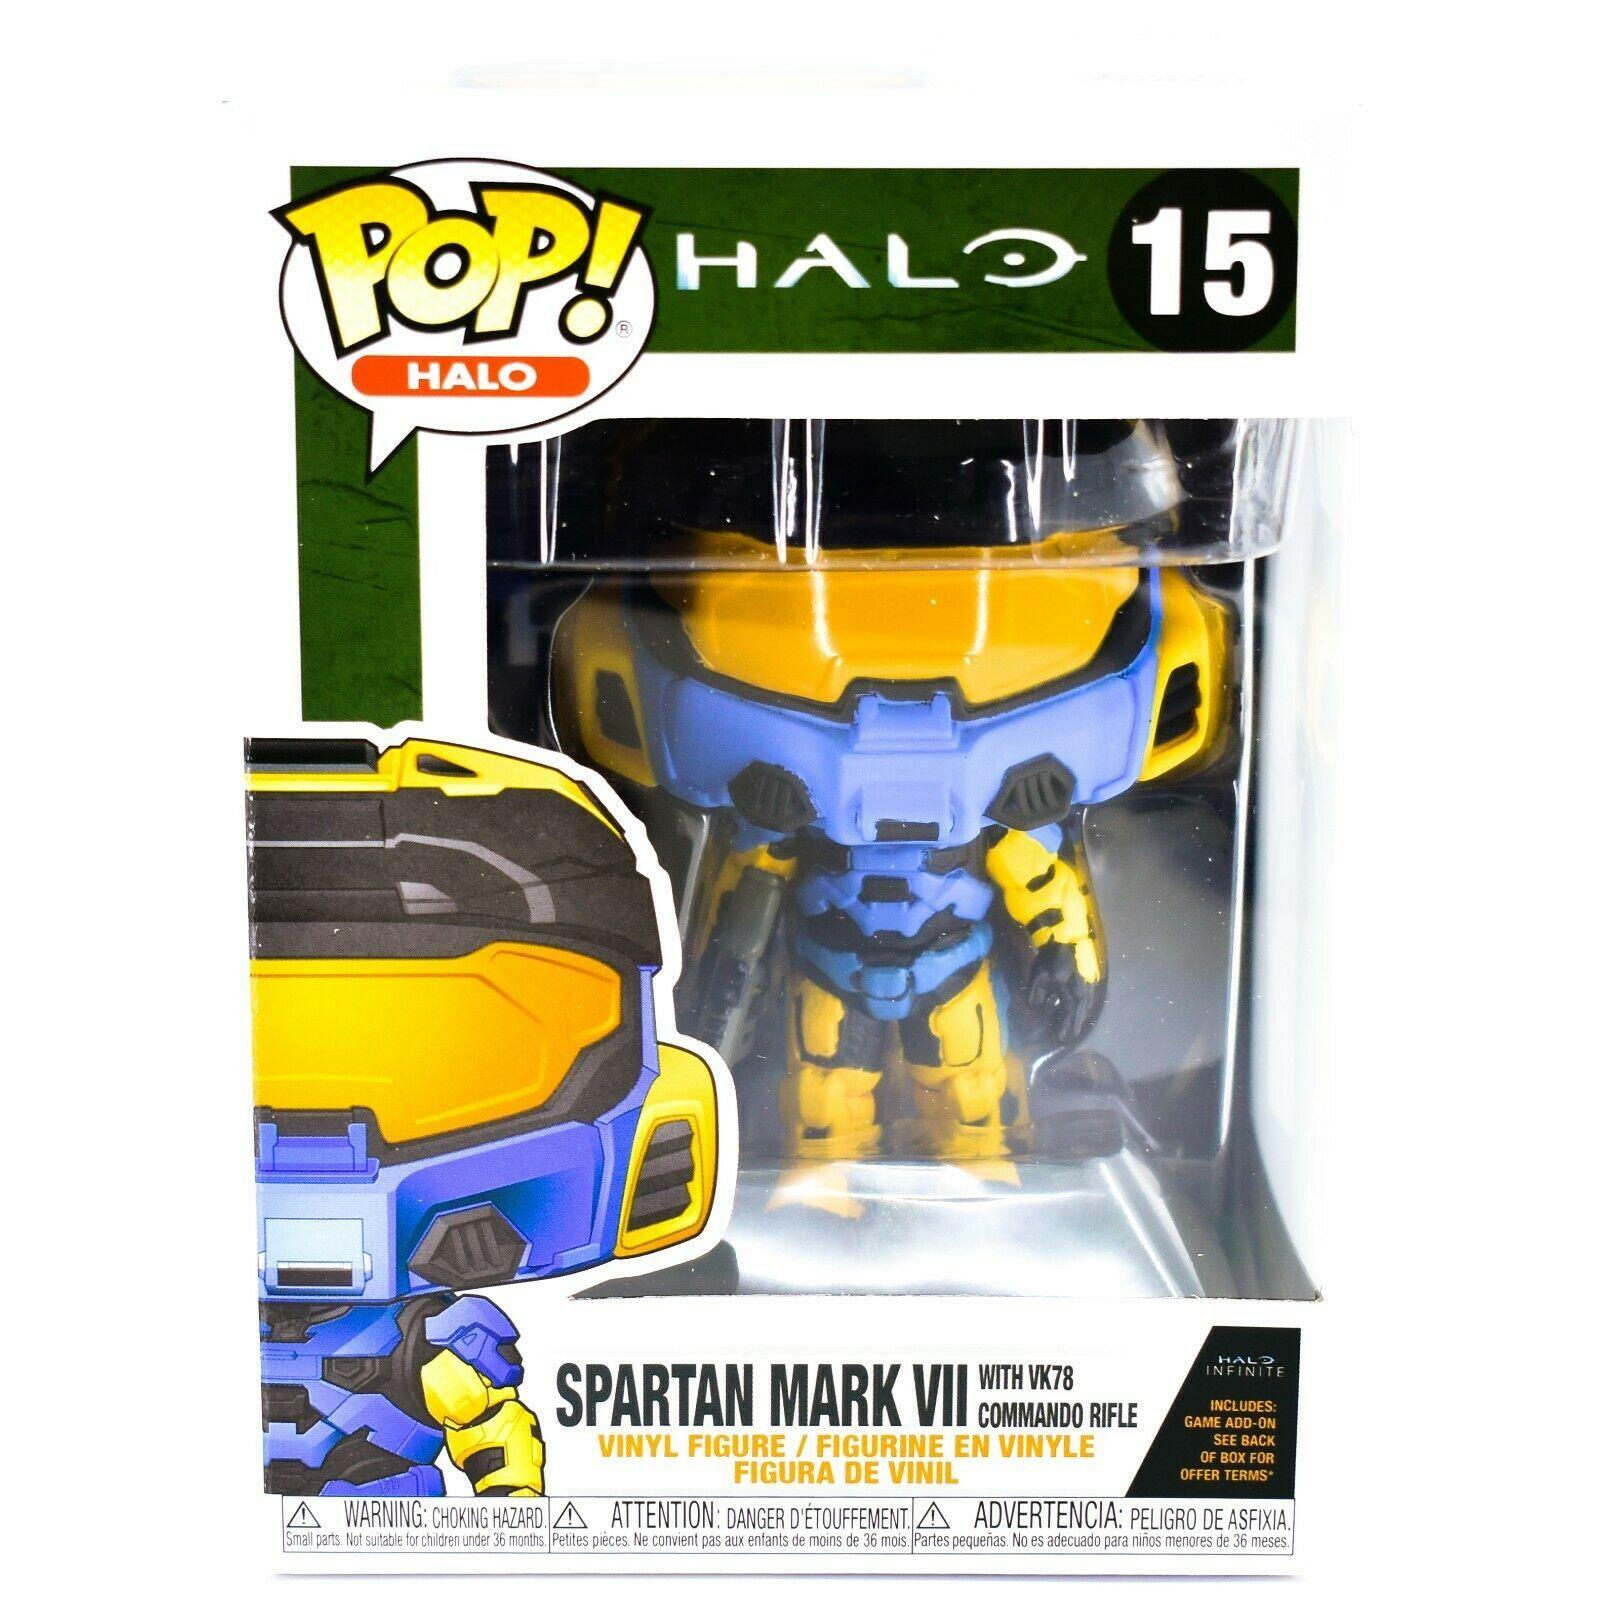 Funko Pop! Halo Infinite Spartan Mark VII Deco #15 Vinyl Figure w Game Add-On